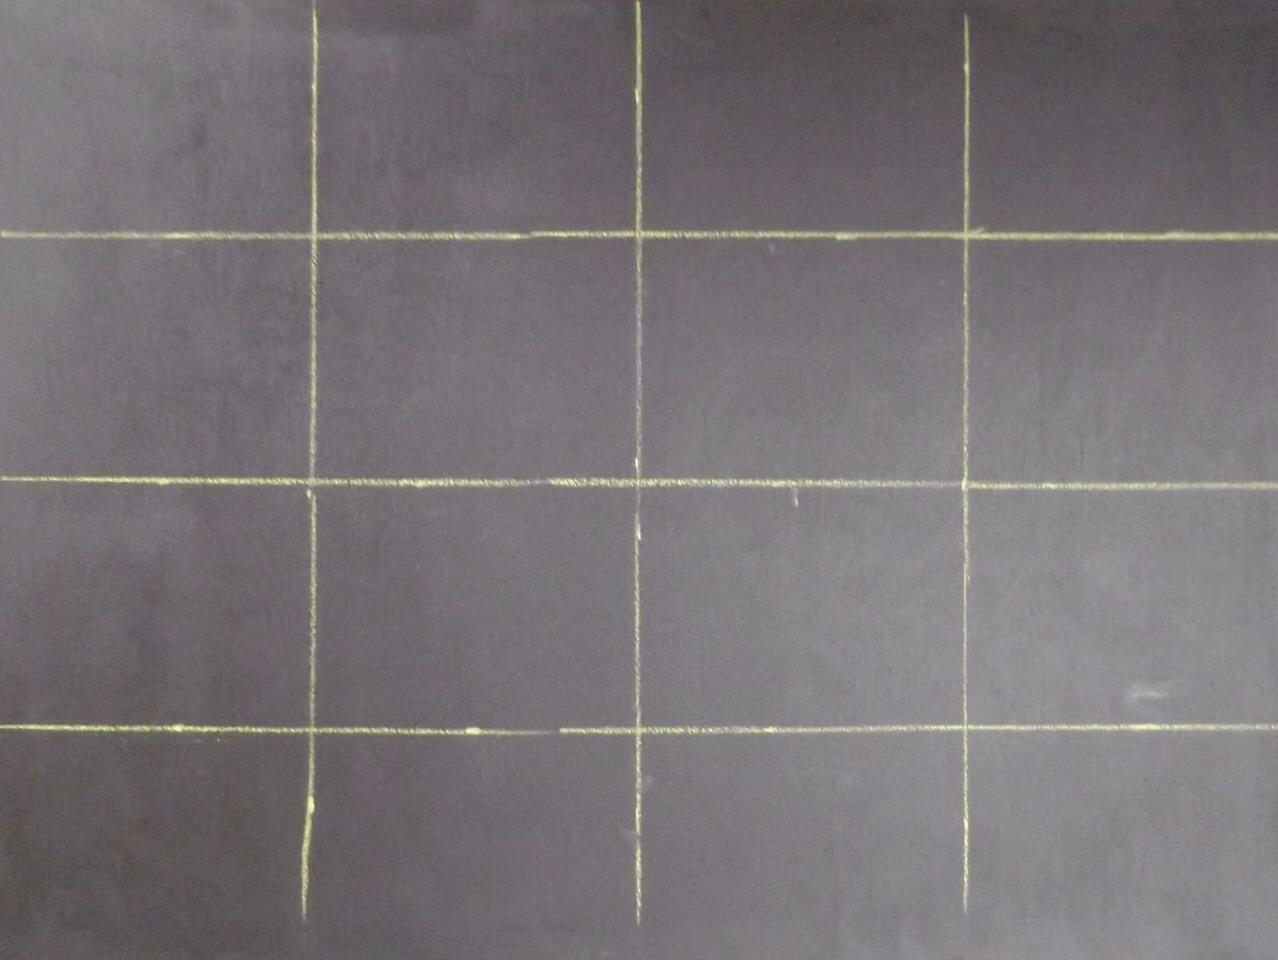 How To Paint Chevron Stripes On A Wall Trusper